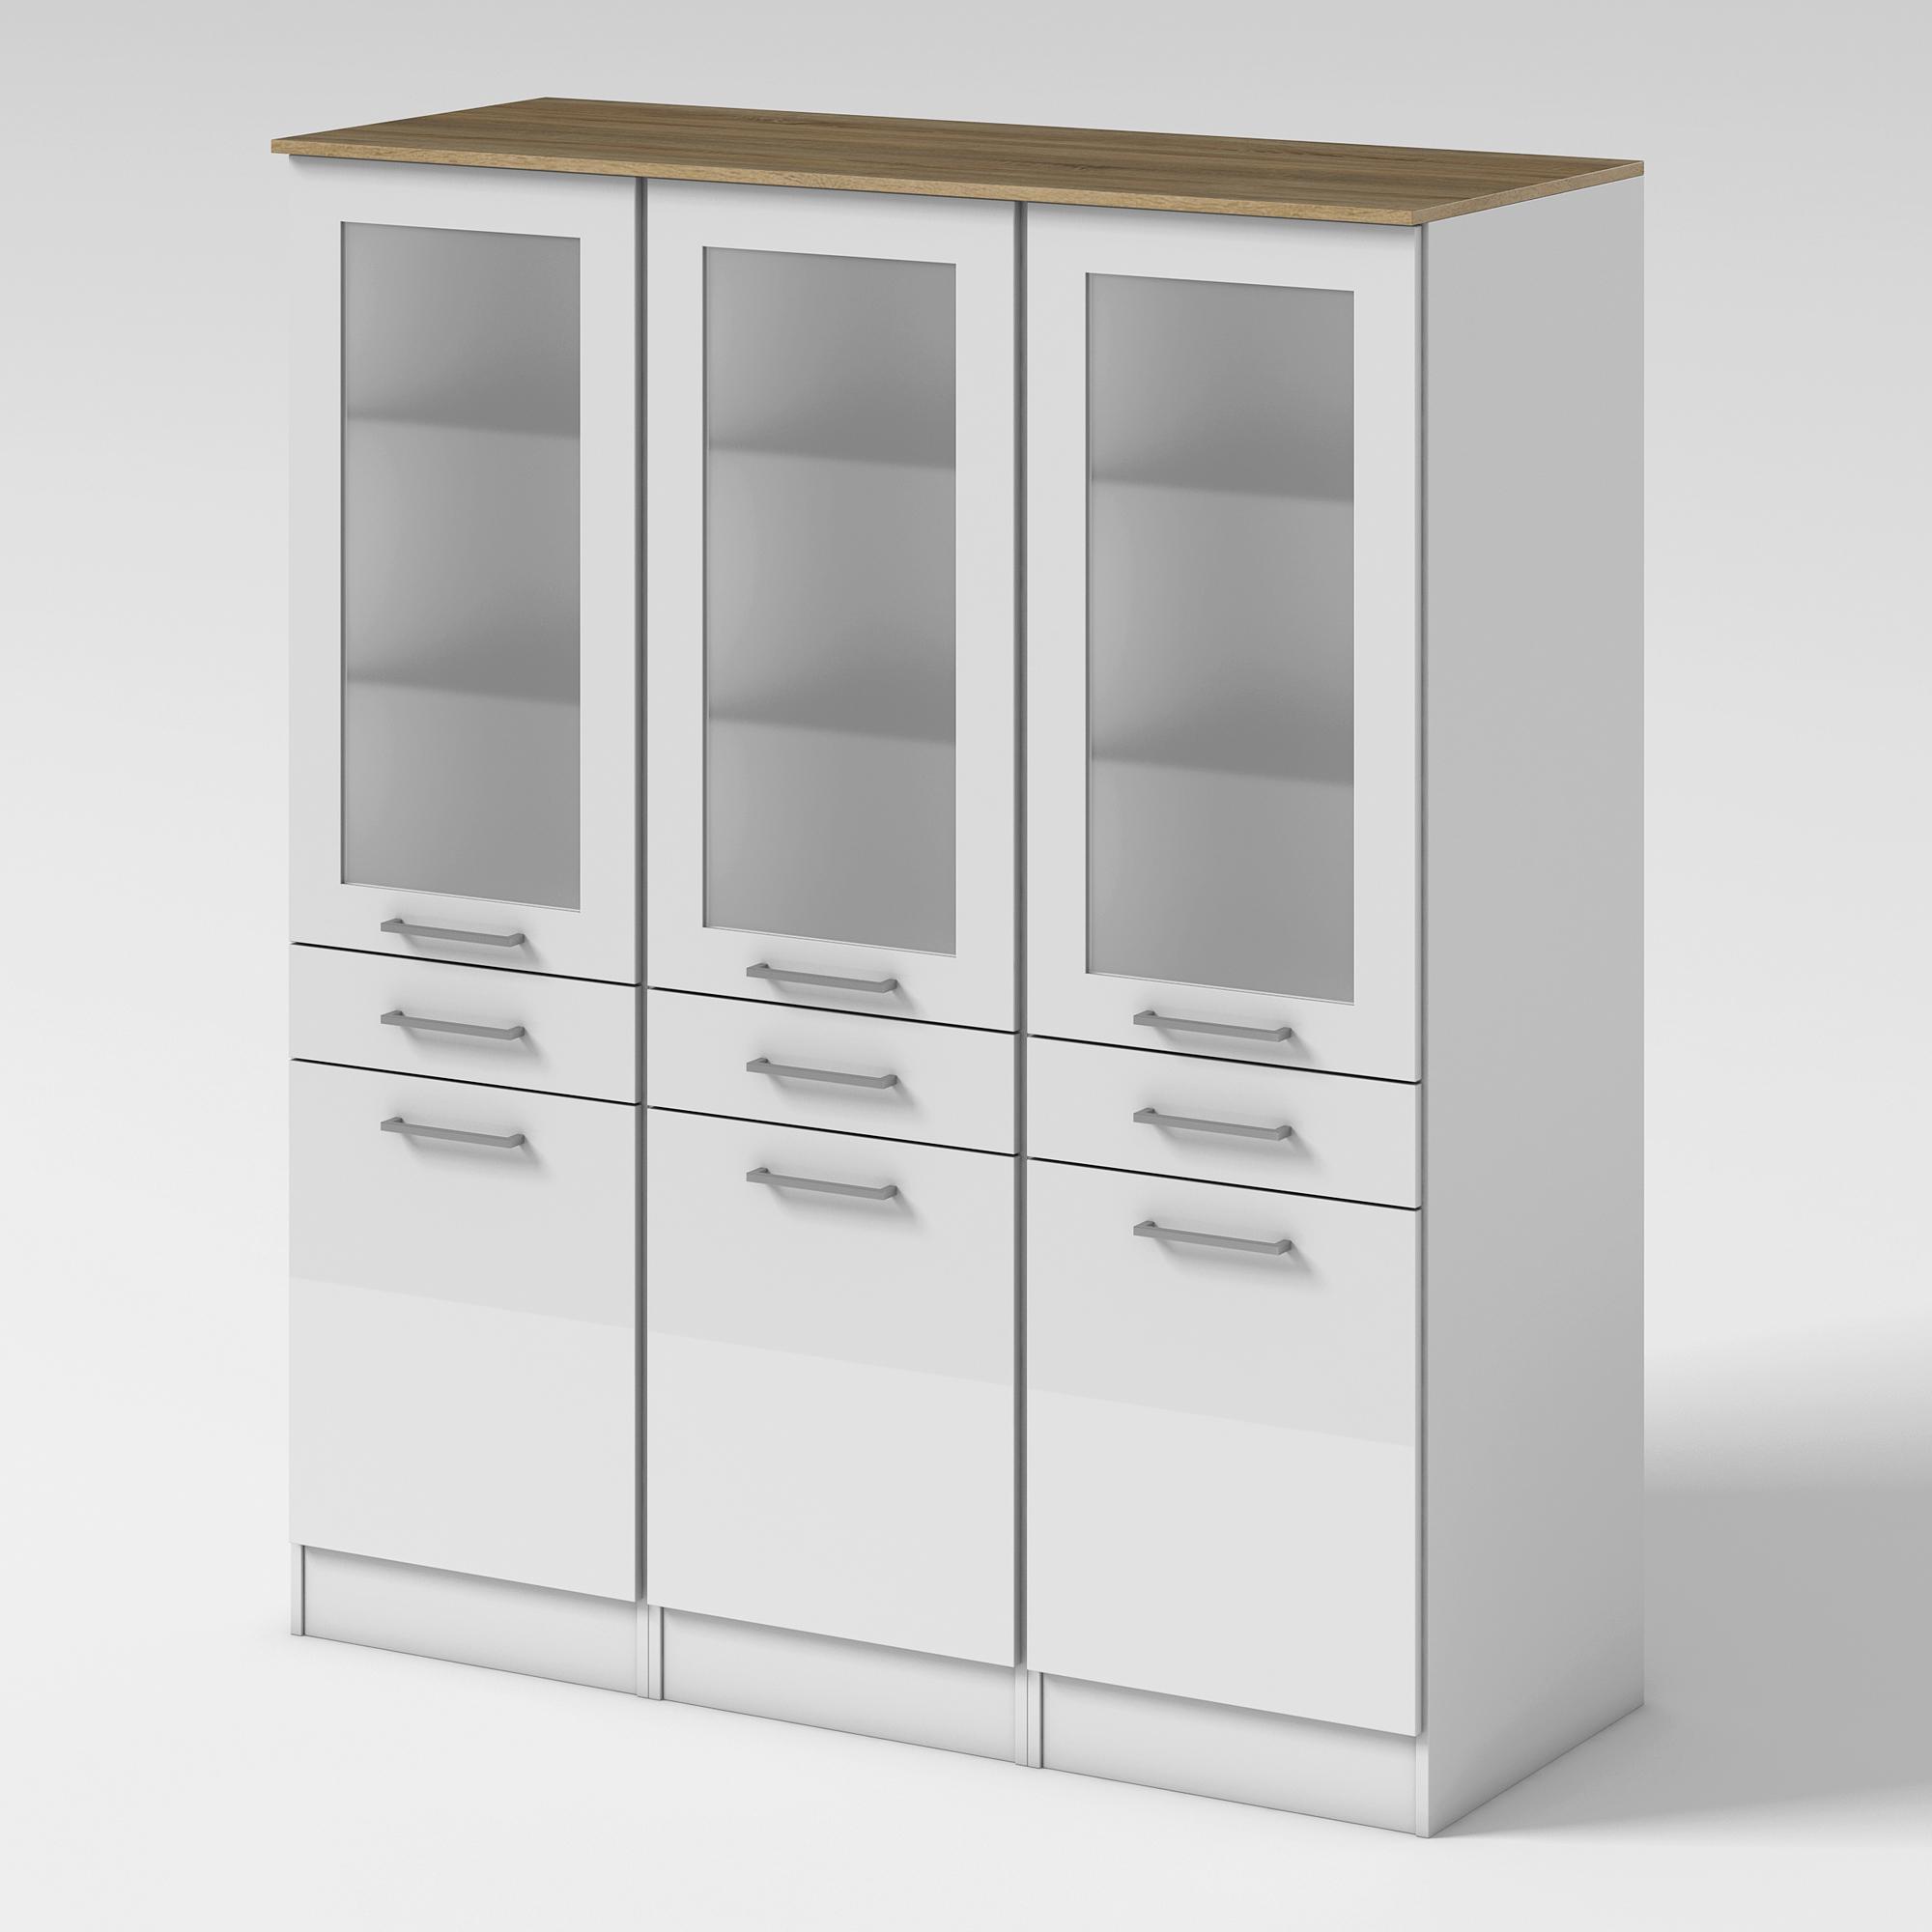 wei hochglanz 150 cm breit good tecnos sideboard breite cm with wei hochglanz 150 cm breit. Black Bedroom Furniture Sets. Home Design Ideas